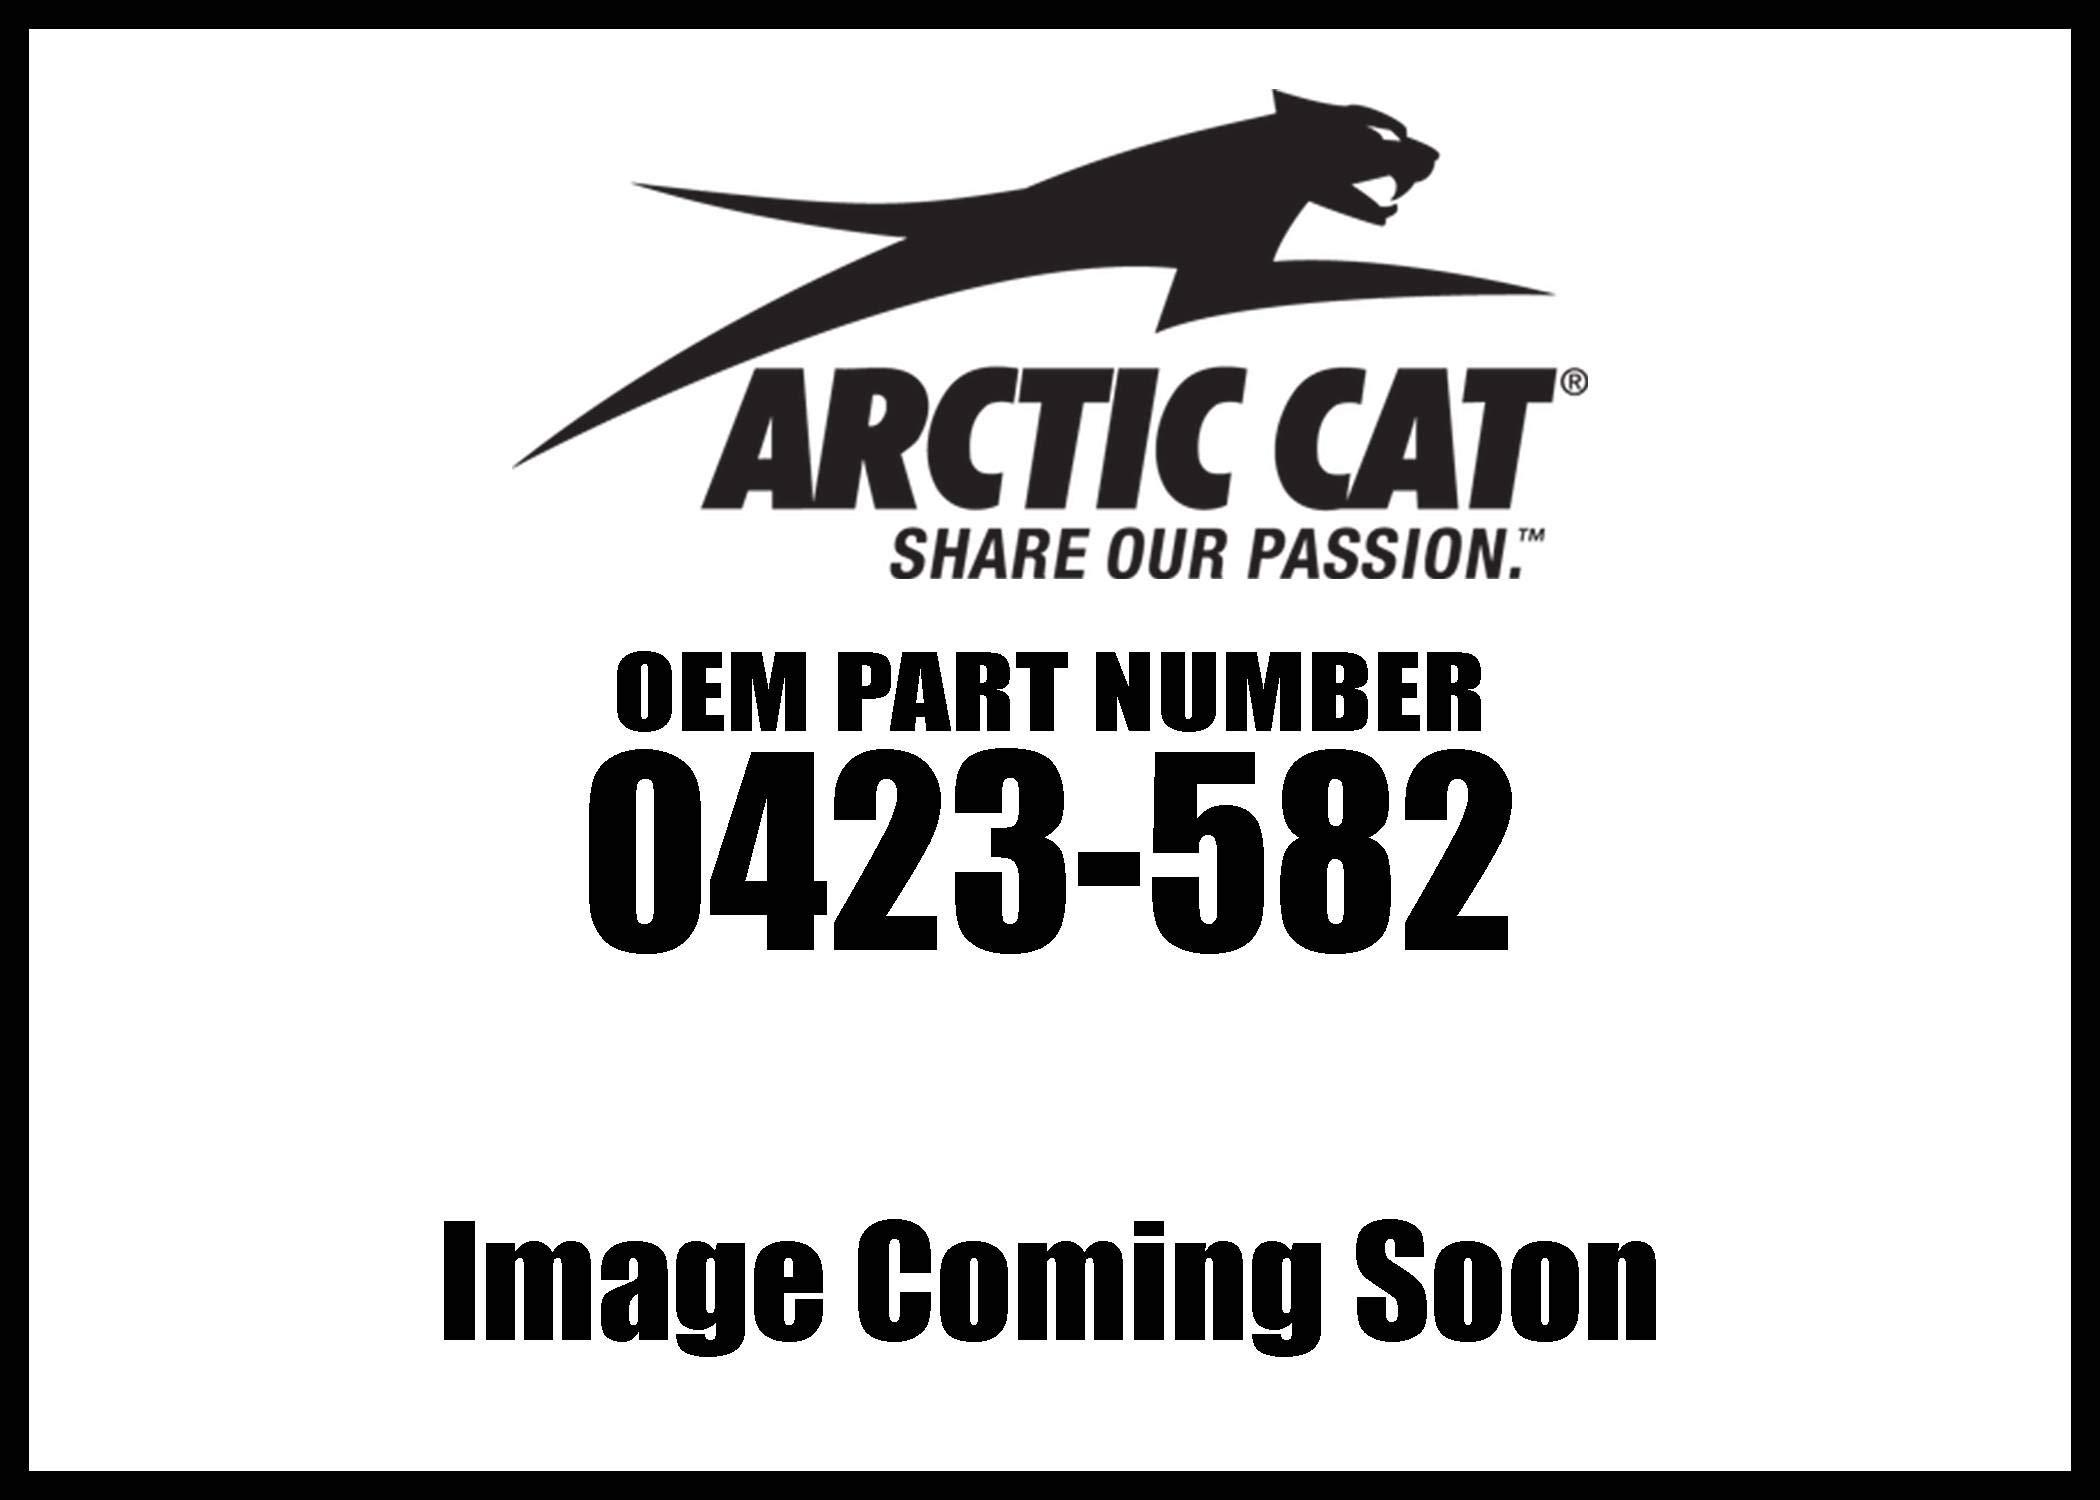 Arctic Cat Hitch Pin Clip Zp3/32'' Od X 1 5/8''Plow 0423-582 New Oem